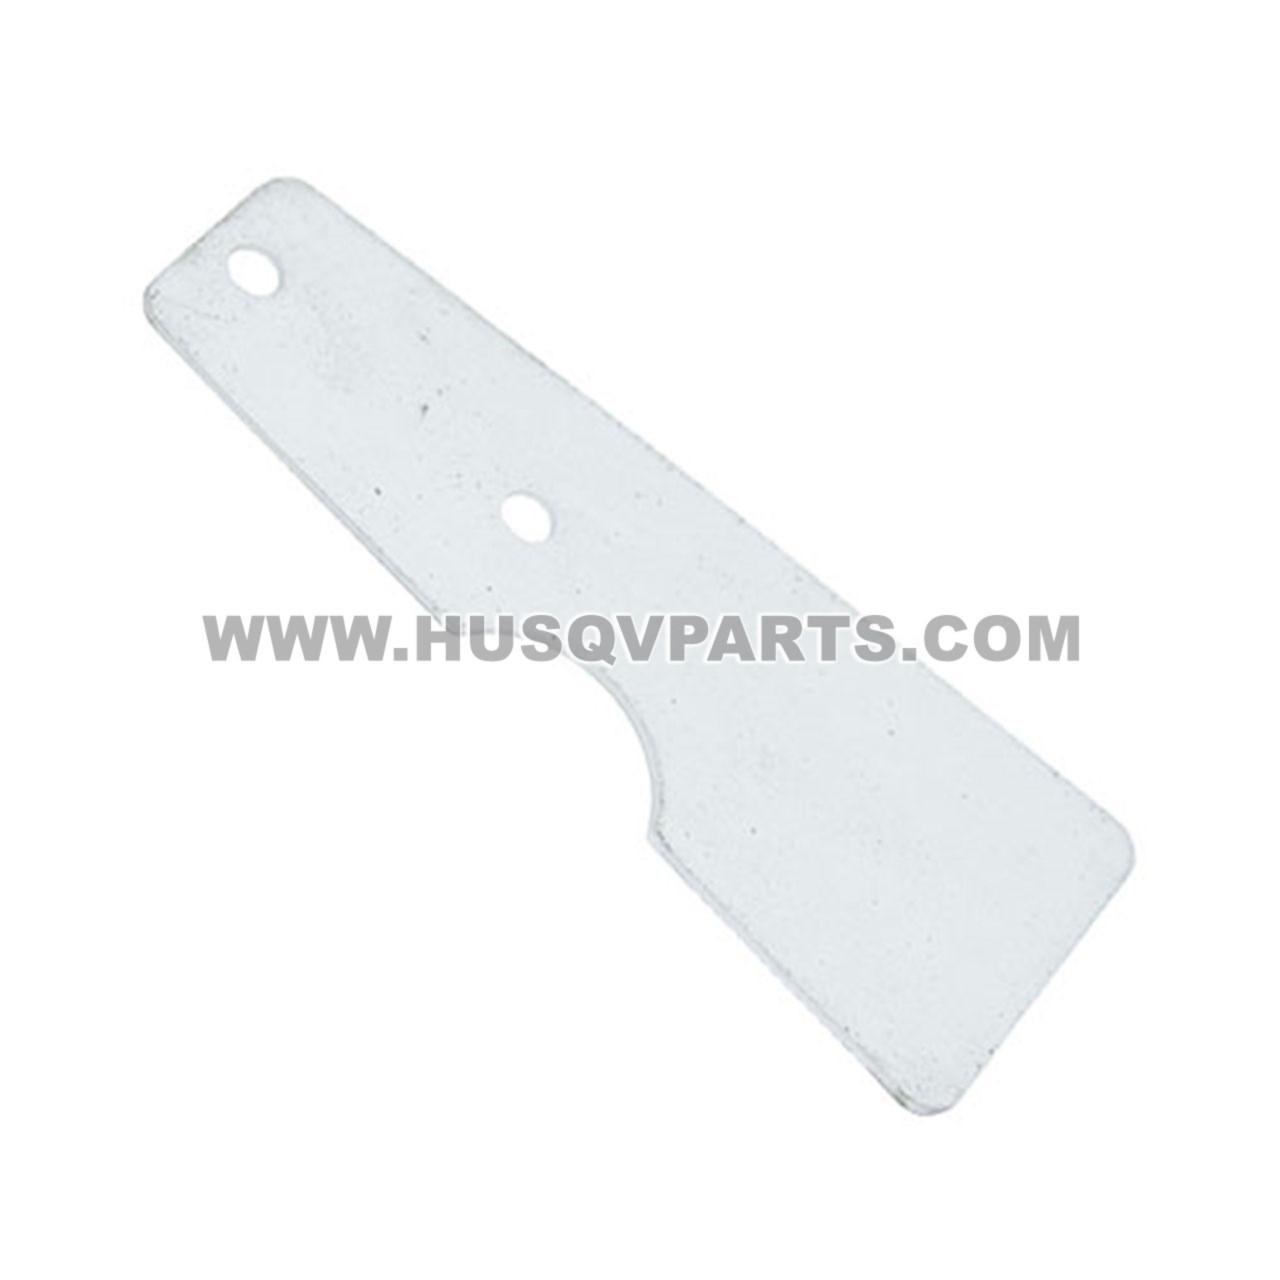 HUSQVARNA Seal 577753801 Image 1